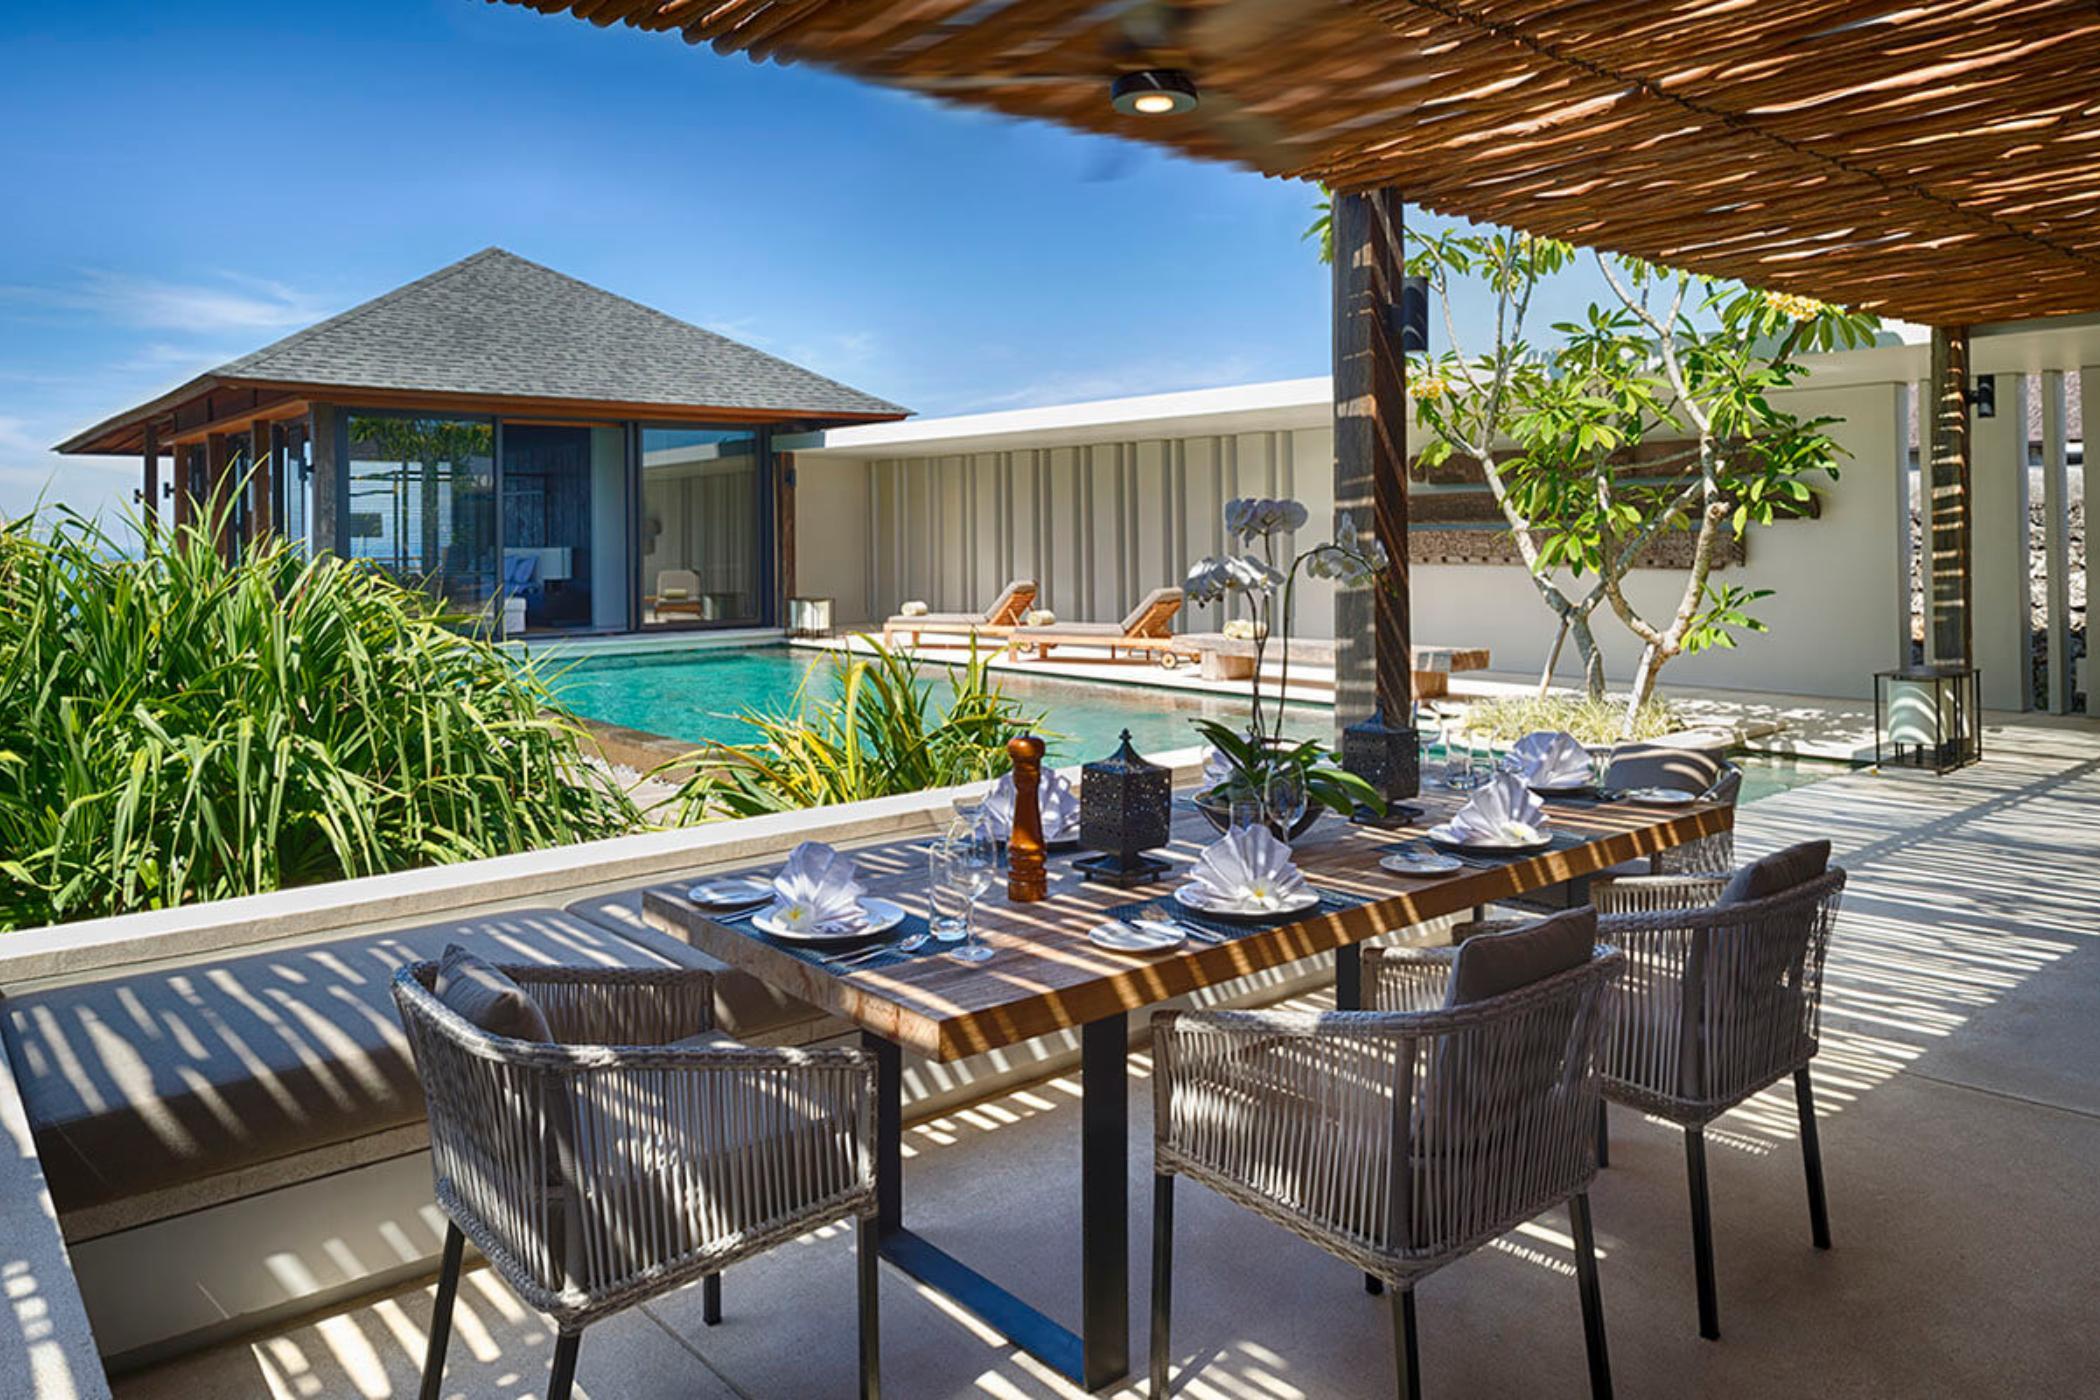 Sohamsa-Estate-Villa-Hamsa-Outdoor-dining-with-a-view.jpg